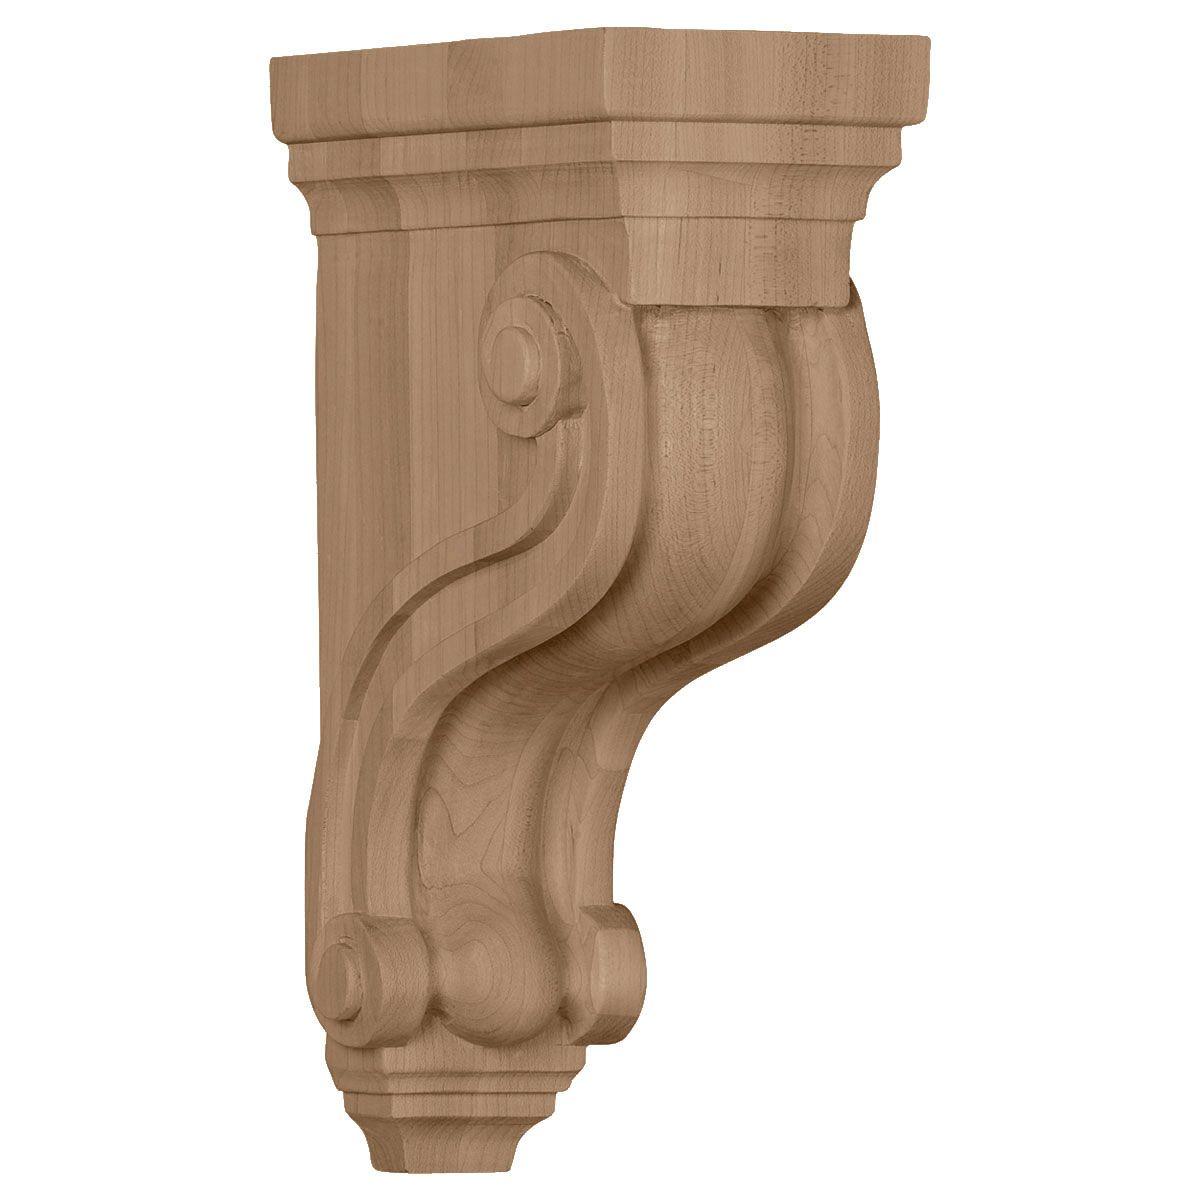 Rubberwood Decorative Wood Corbel Countertop Support 2 Inch Deep